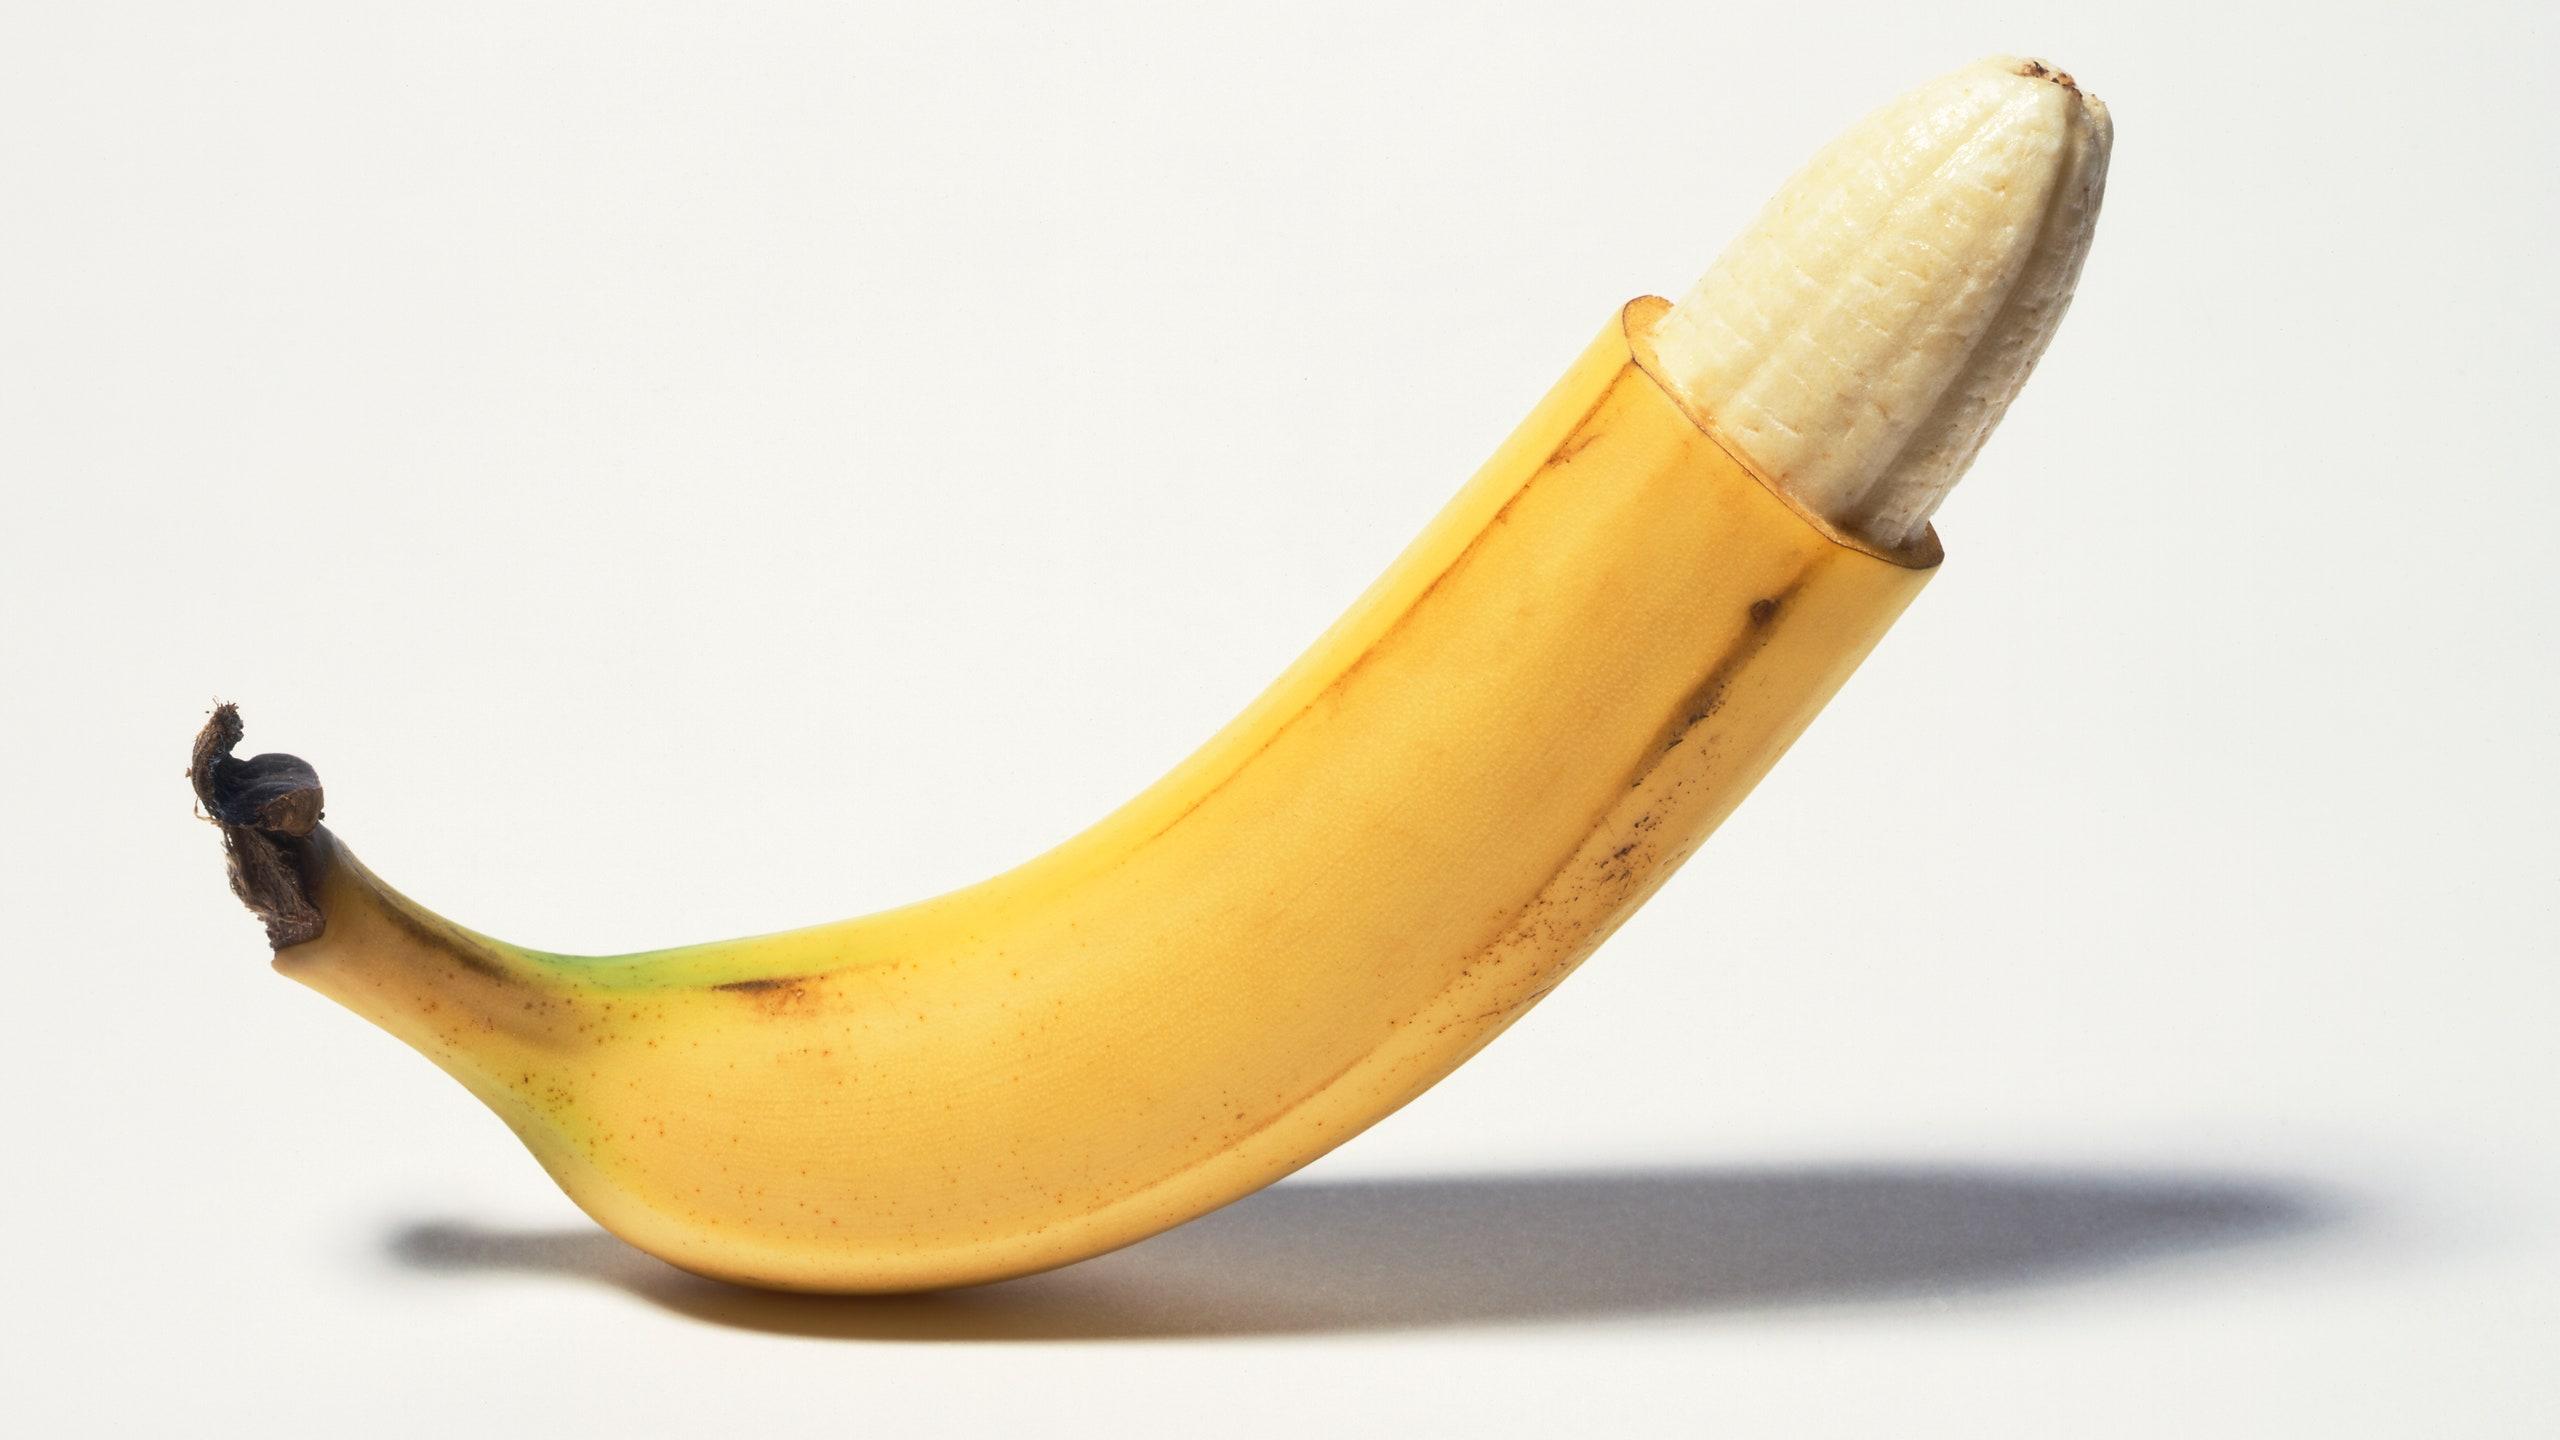 Showing porn images for circumcision humiliation caption